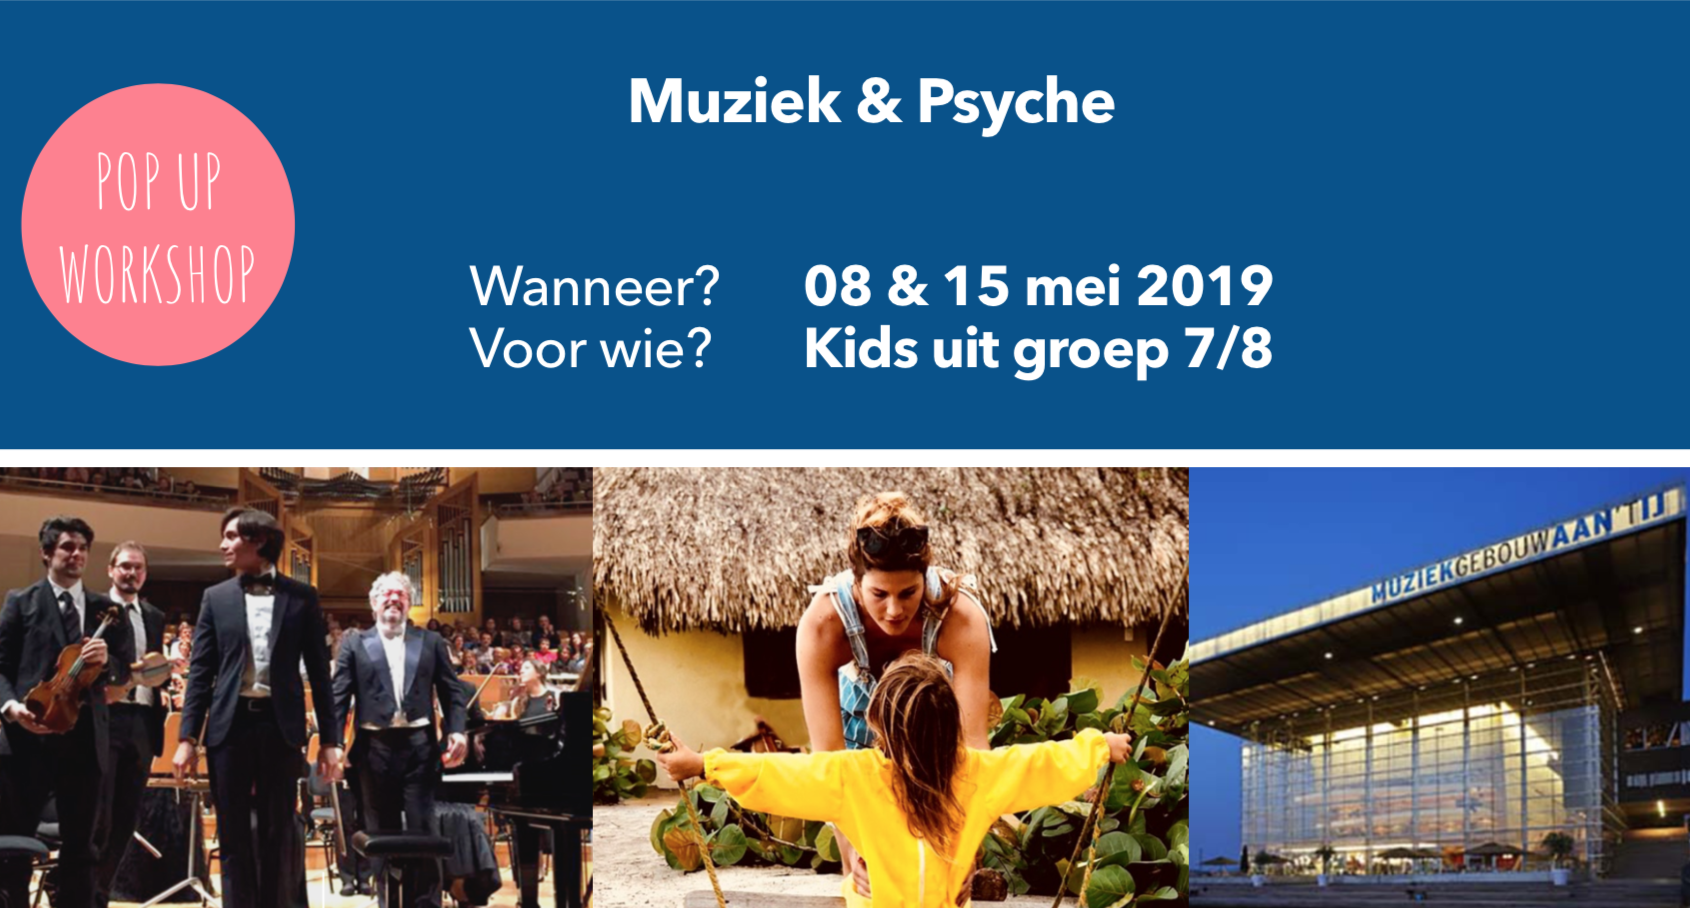 Speciale workshop:Muziek & Psyche - Wanneer? 08 & 15 mei 2019Voor wie? Kids uit groep 7/8